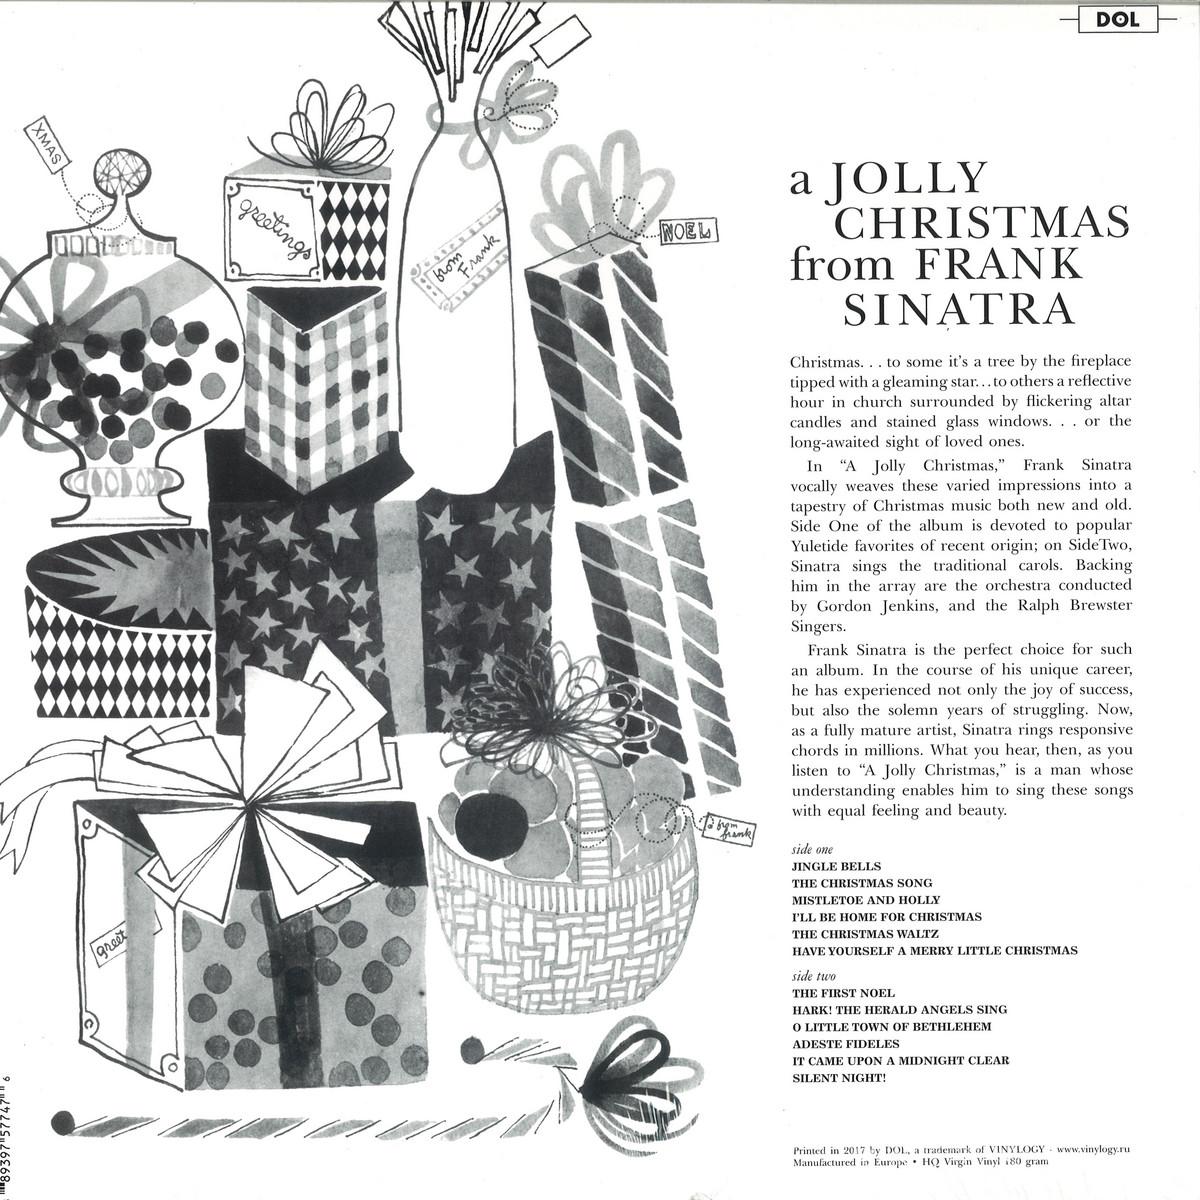 Frank Sinatra - A Jolly Christmas / DOL DOS747H - Vinyl